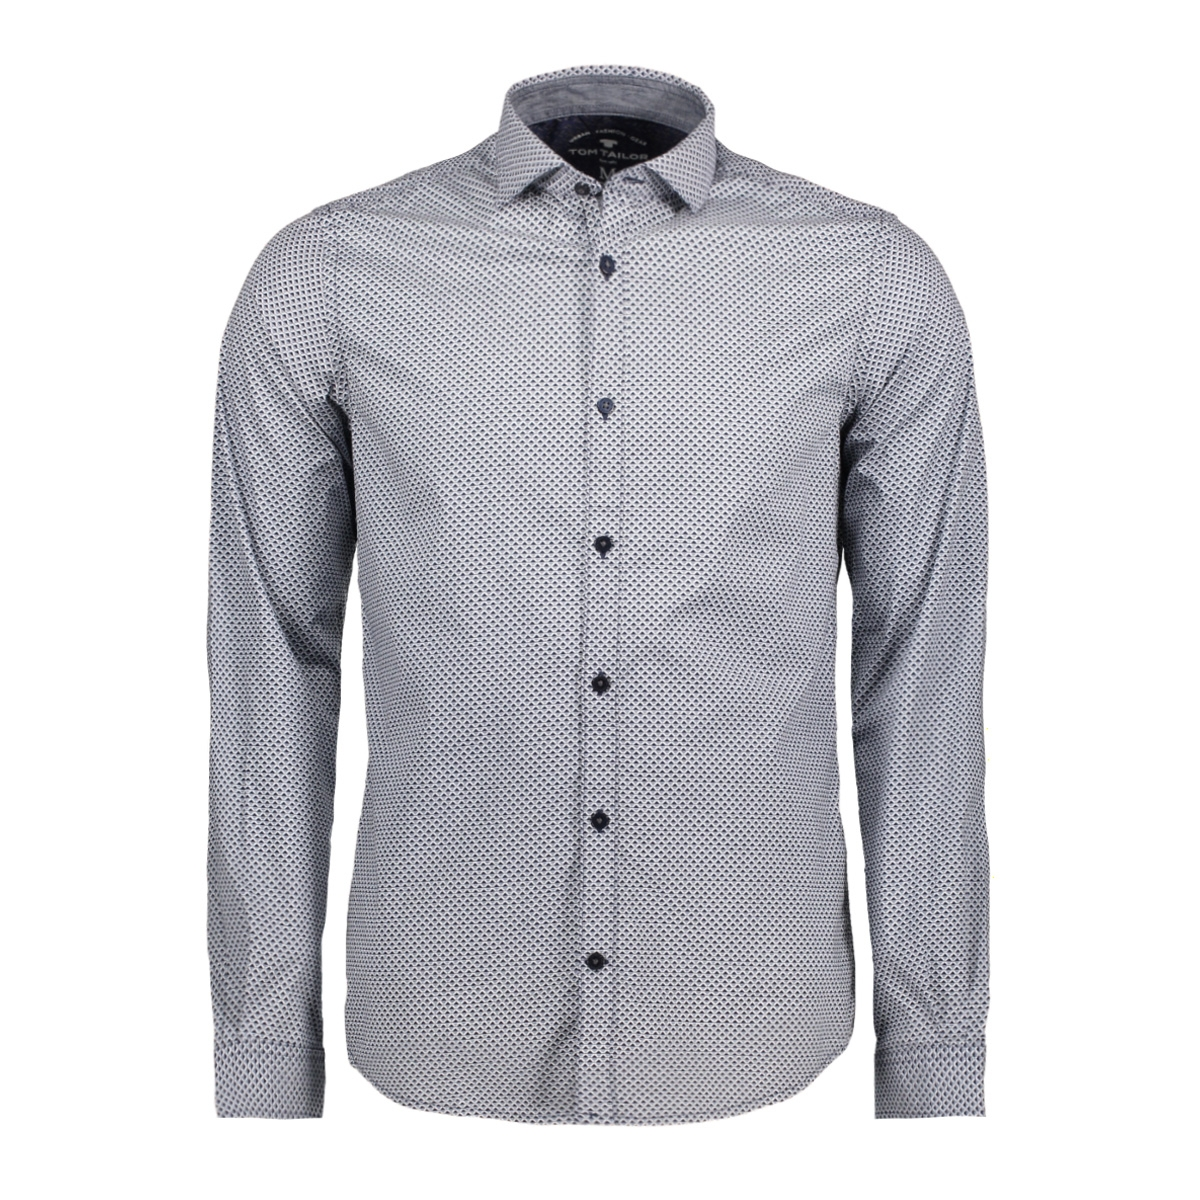 2033860.00.10 tom tailor overhemd 6811